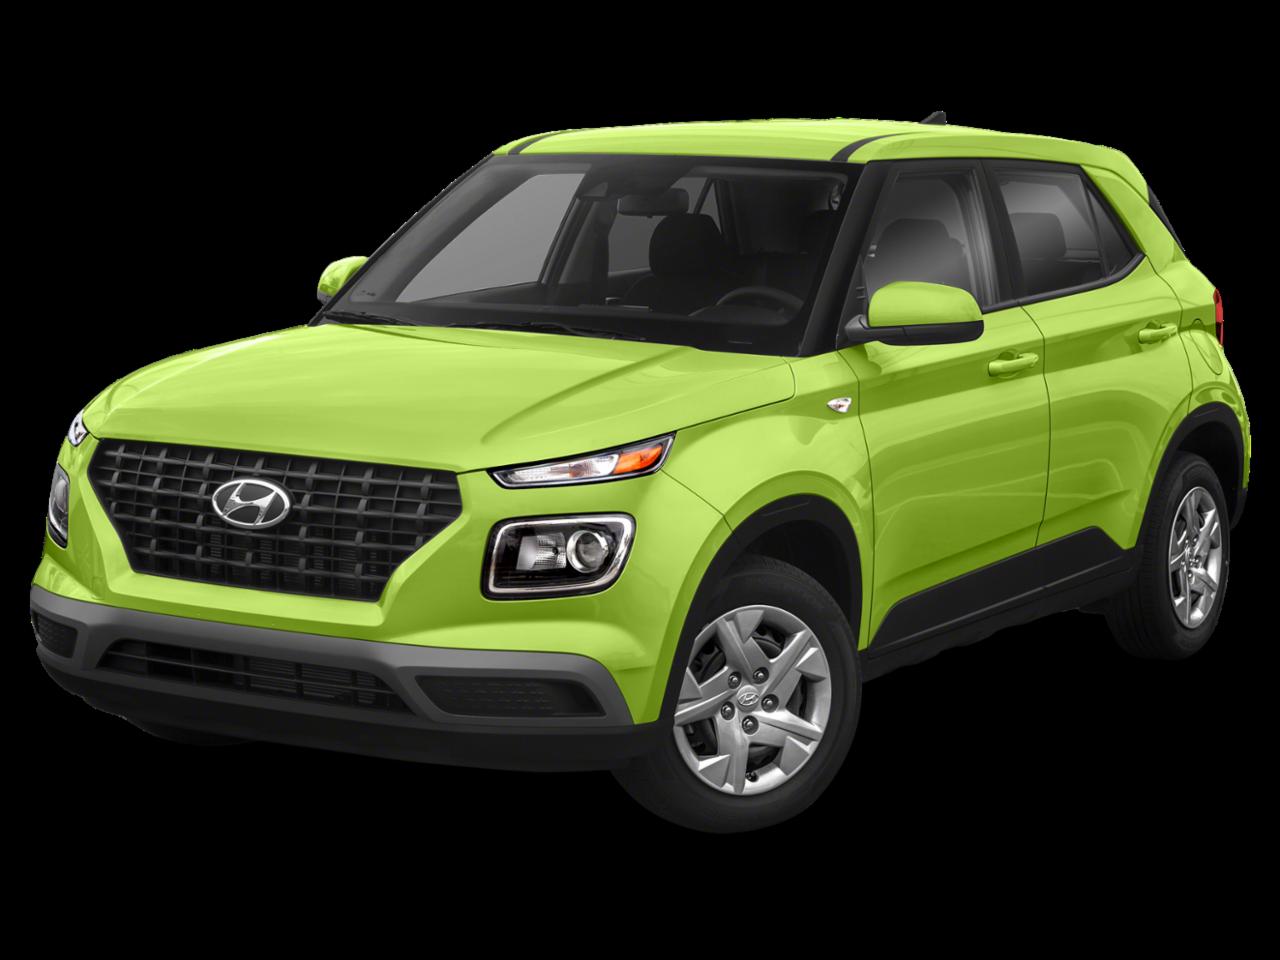 Hyundai 2022 Venue SE